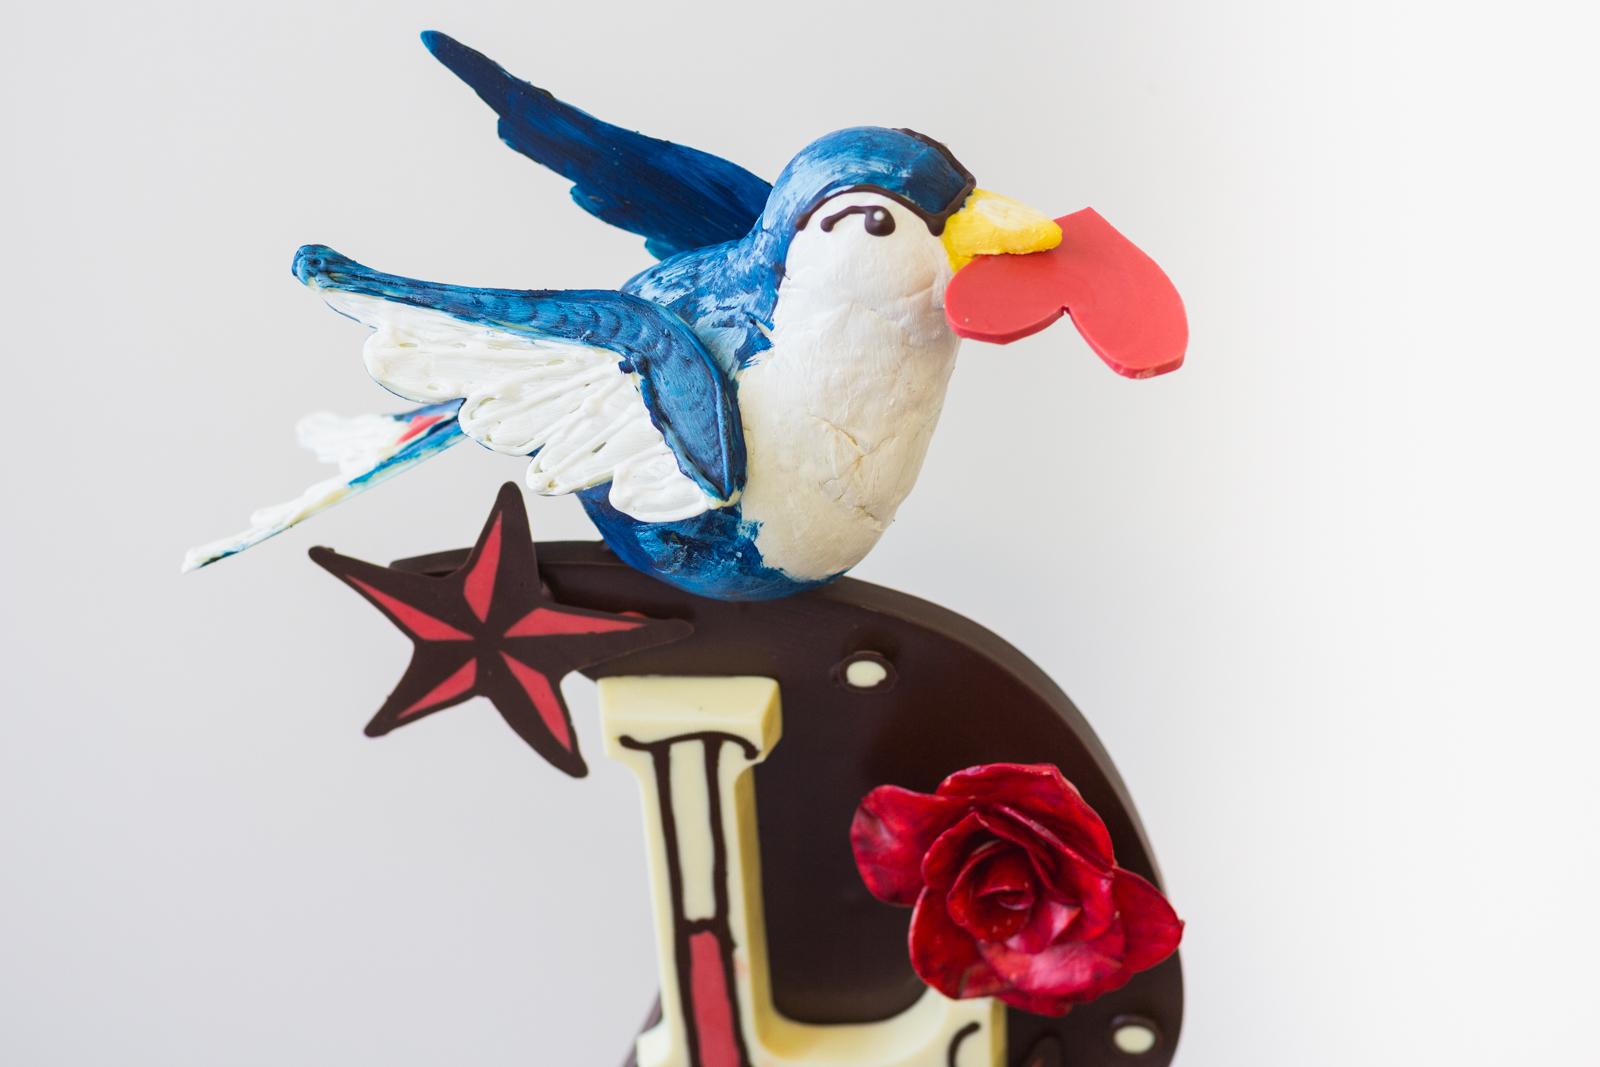 chocolate-sculpture-bird